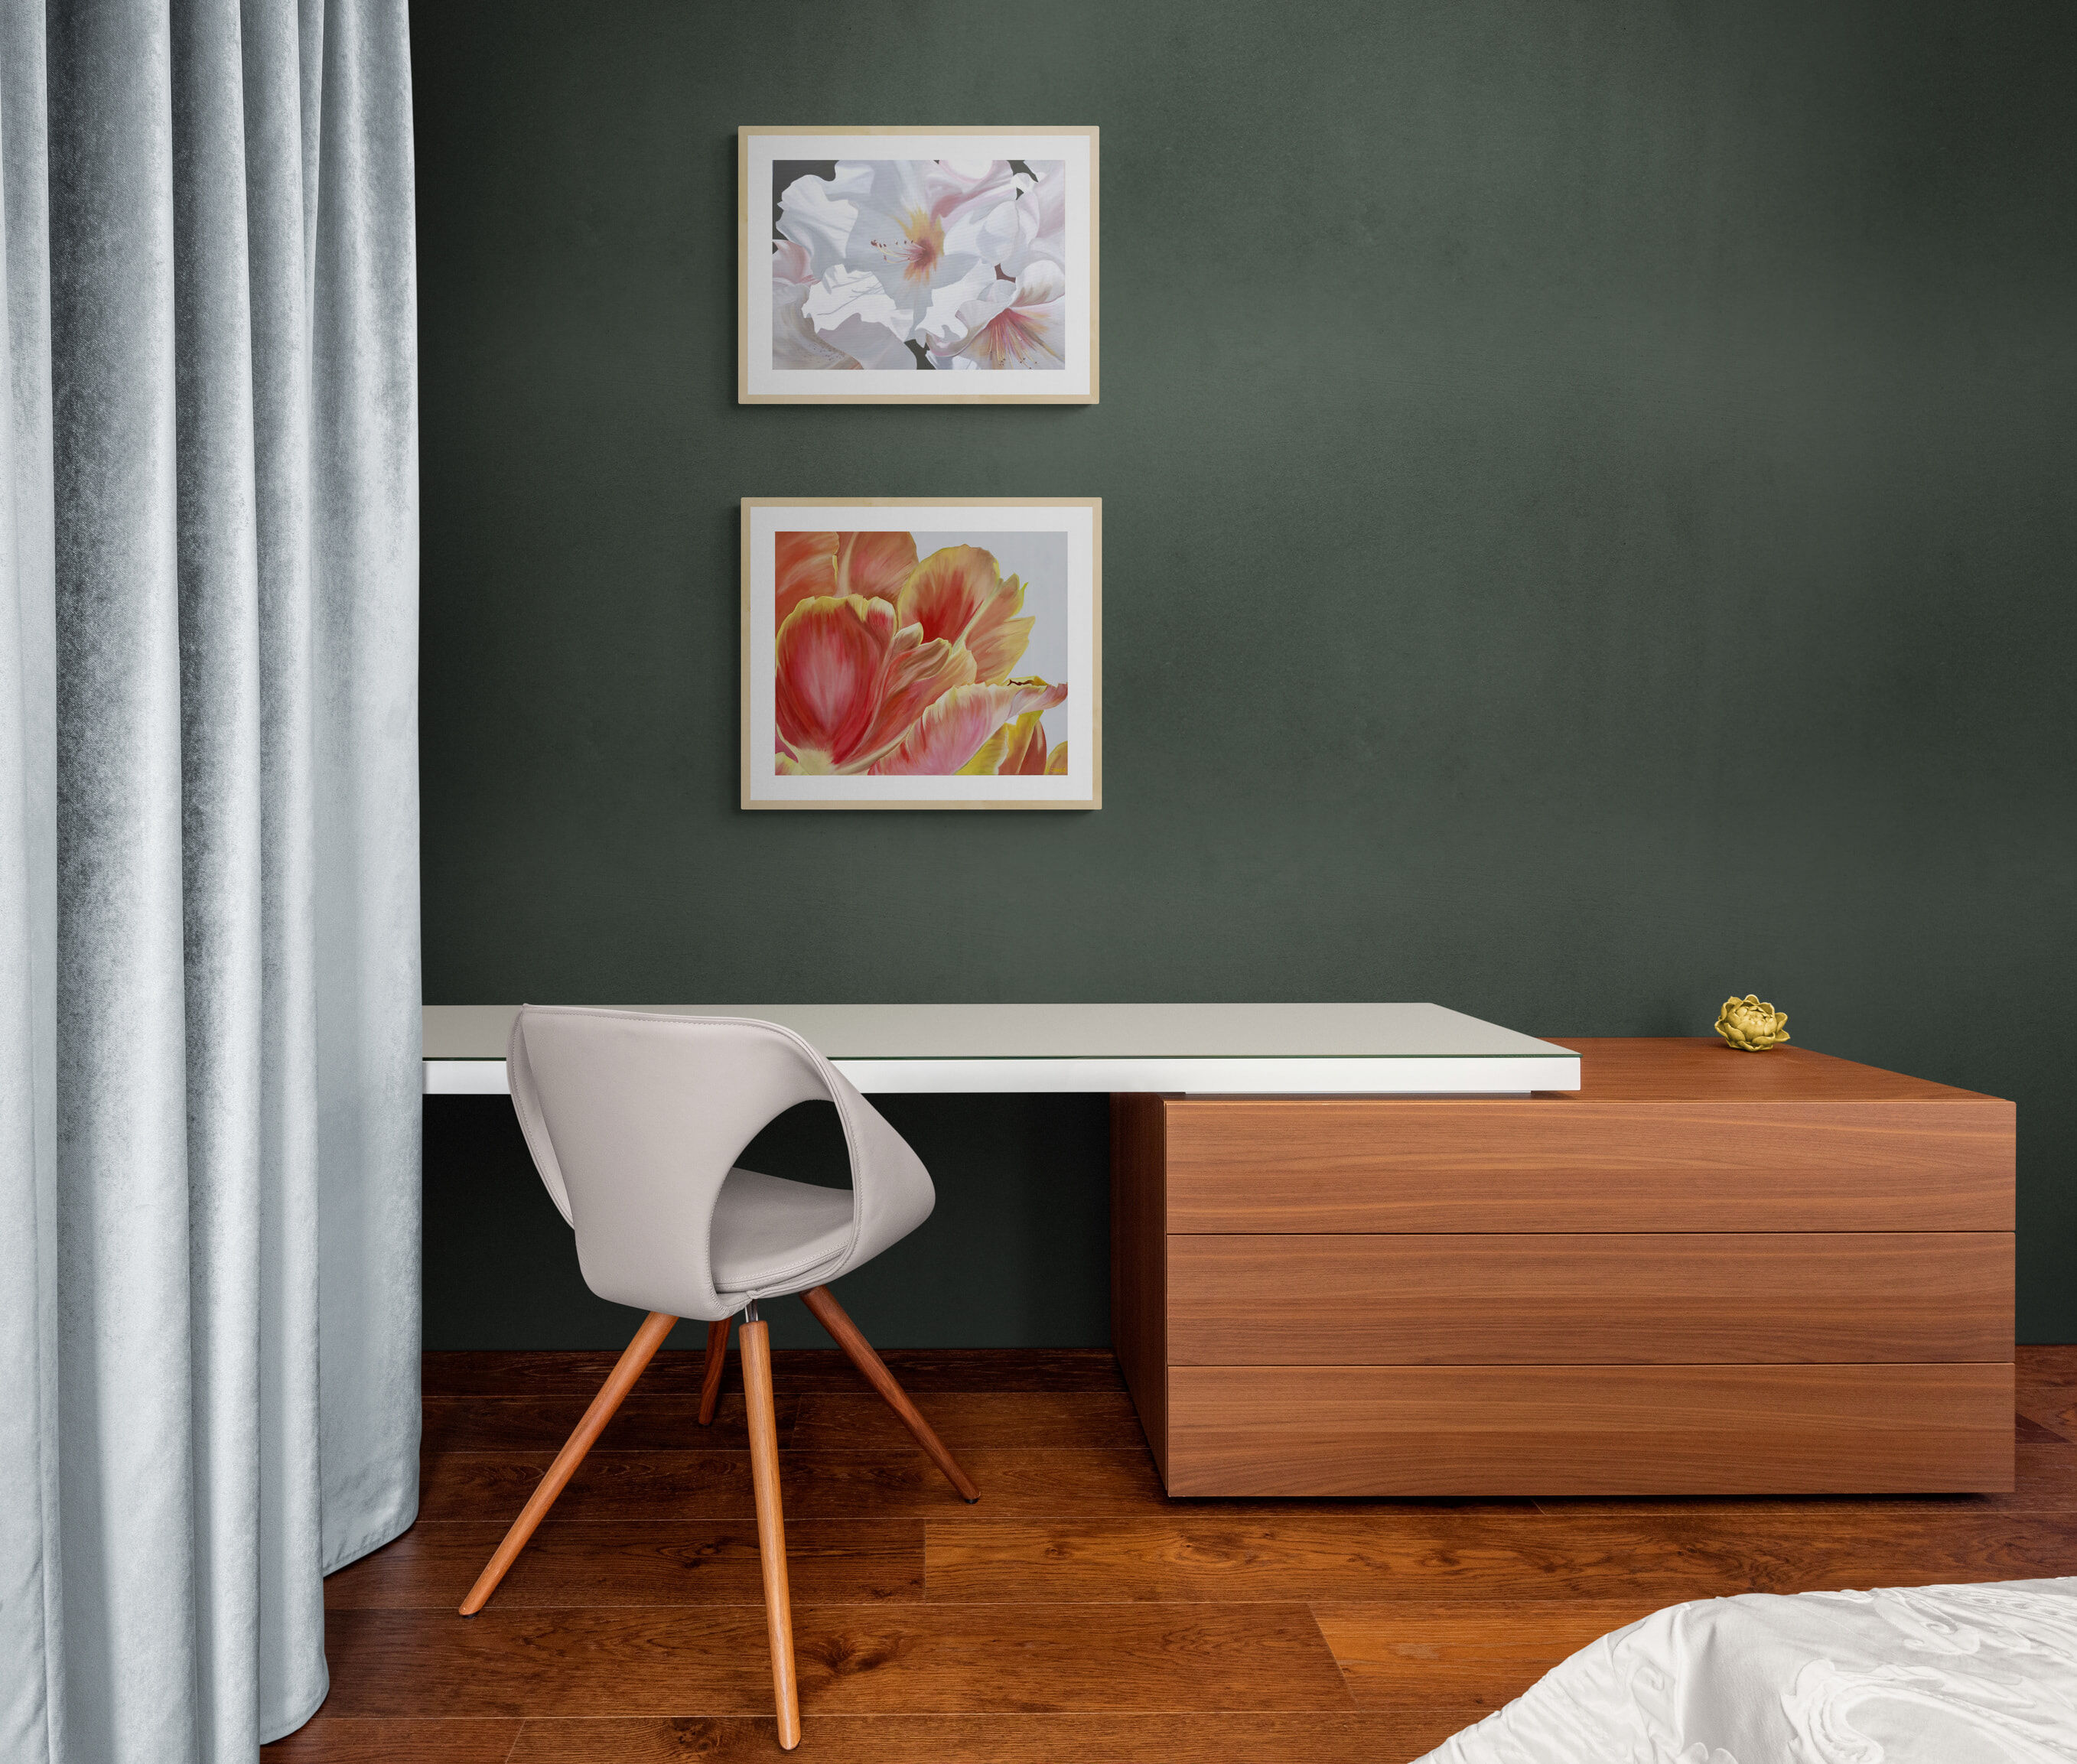 Bedroom_desk_and_cabinet